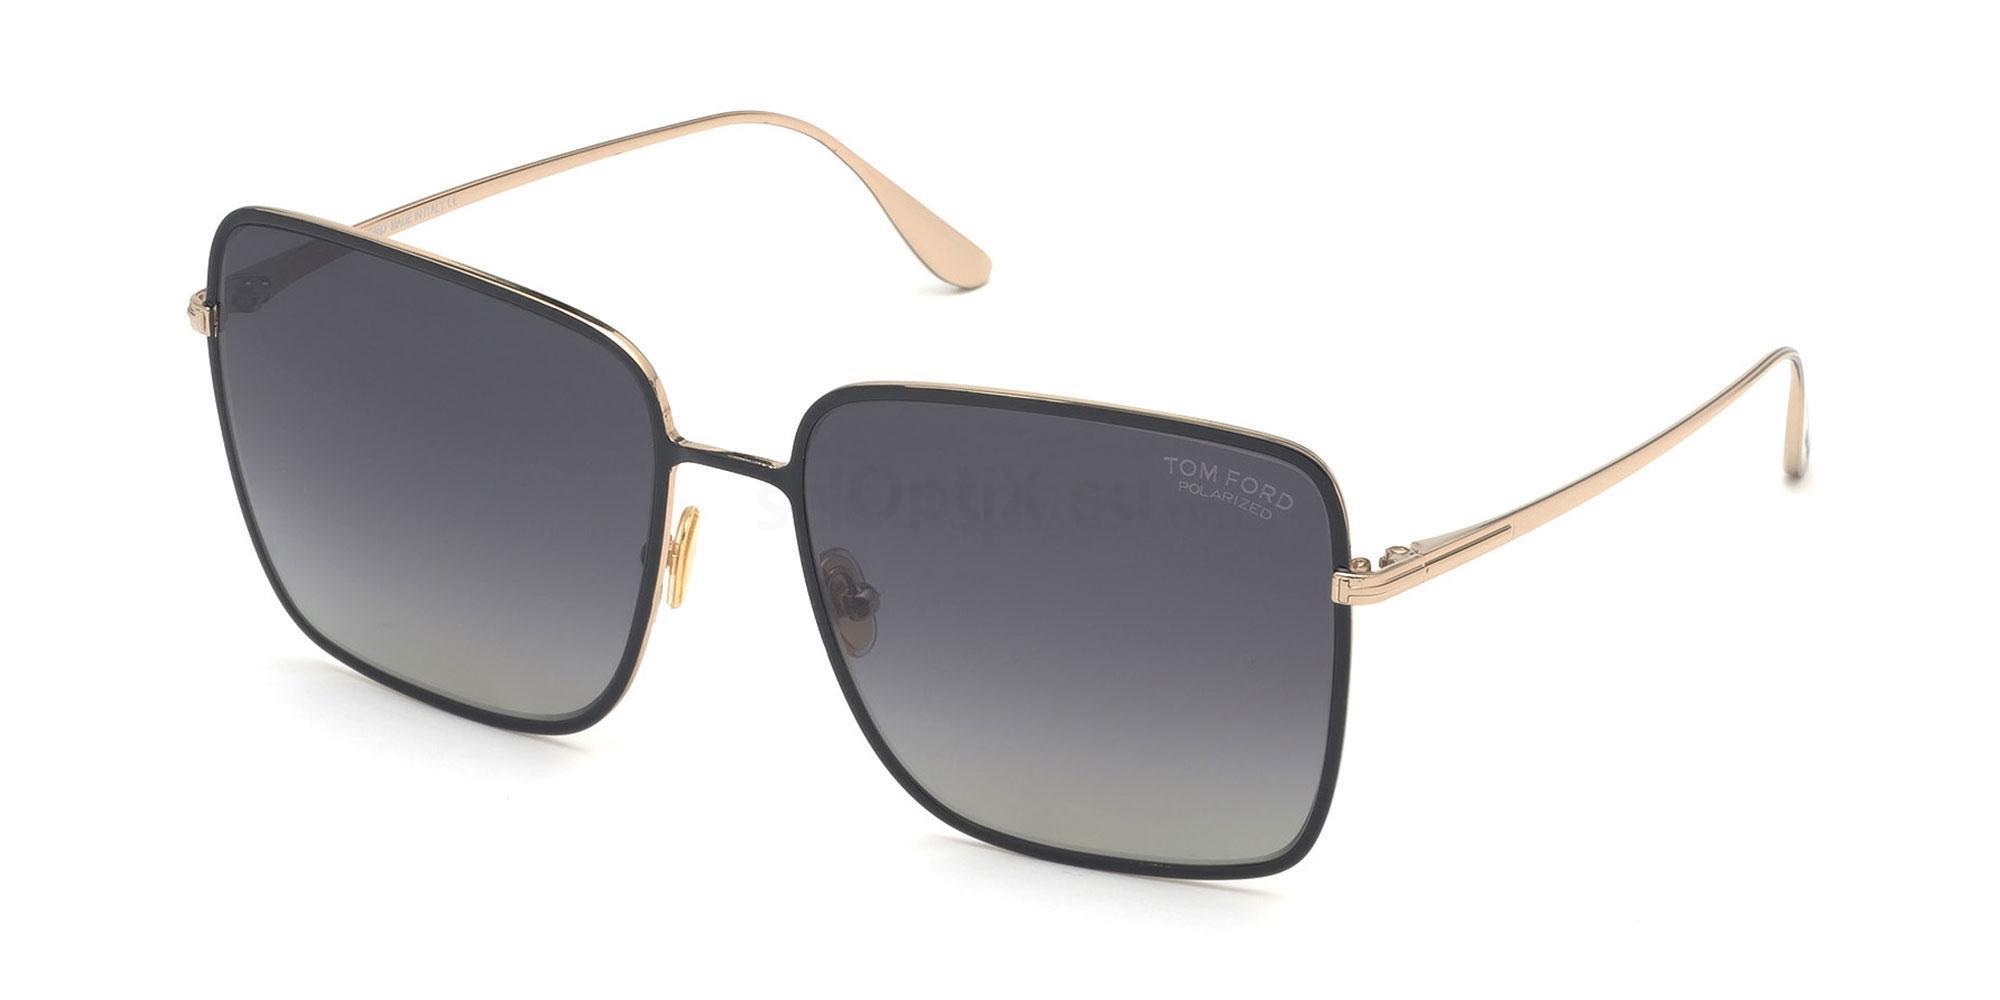 01D FT0739 Sunglasses, Tom Ford